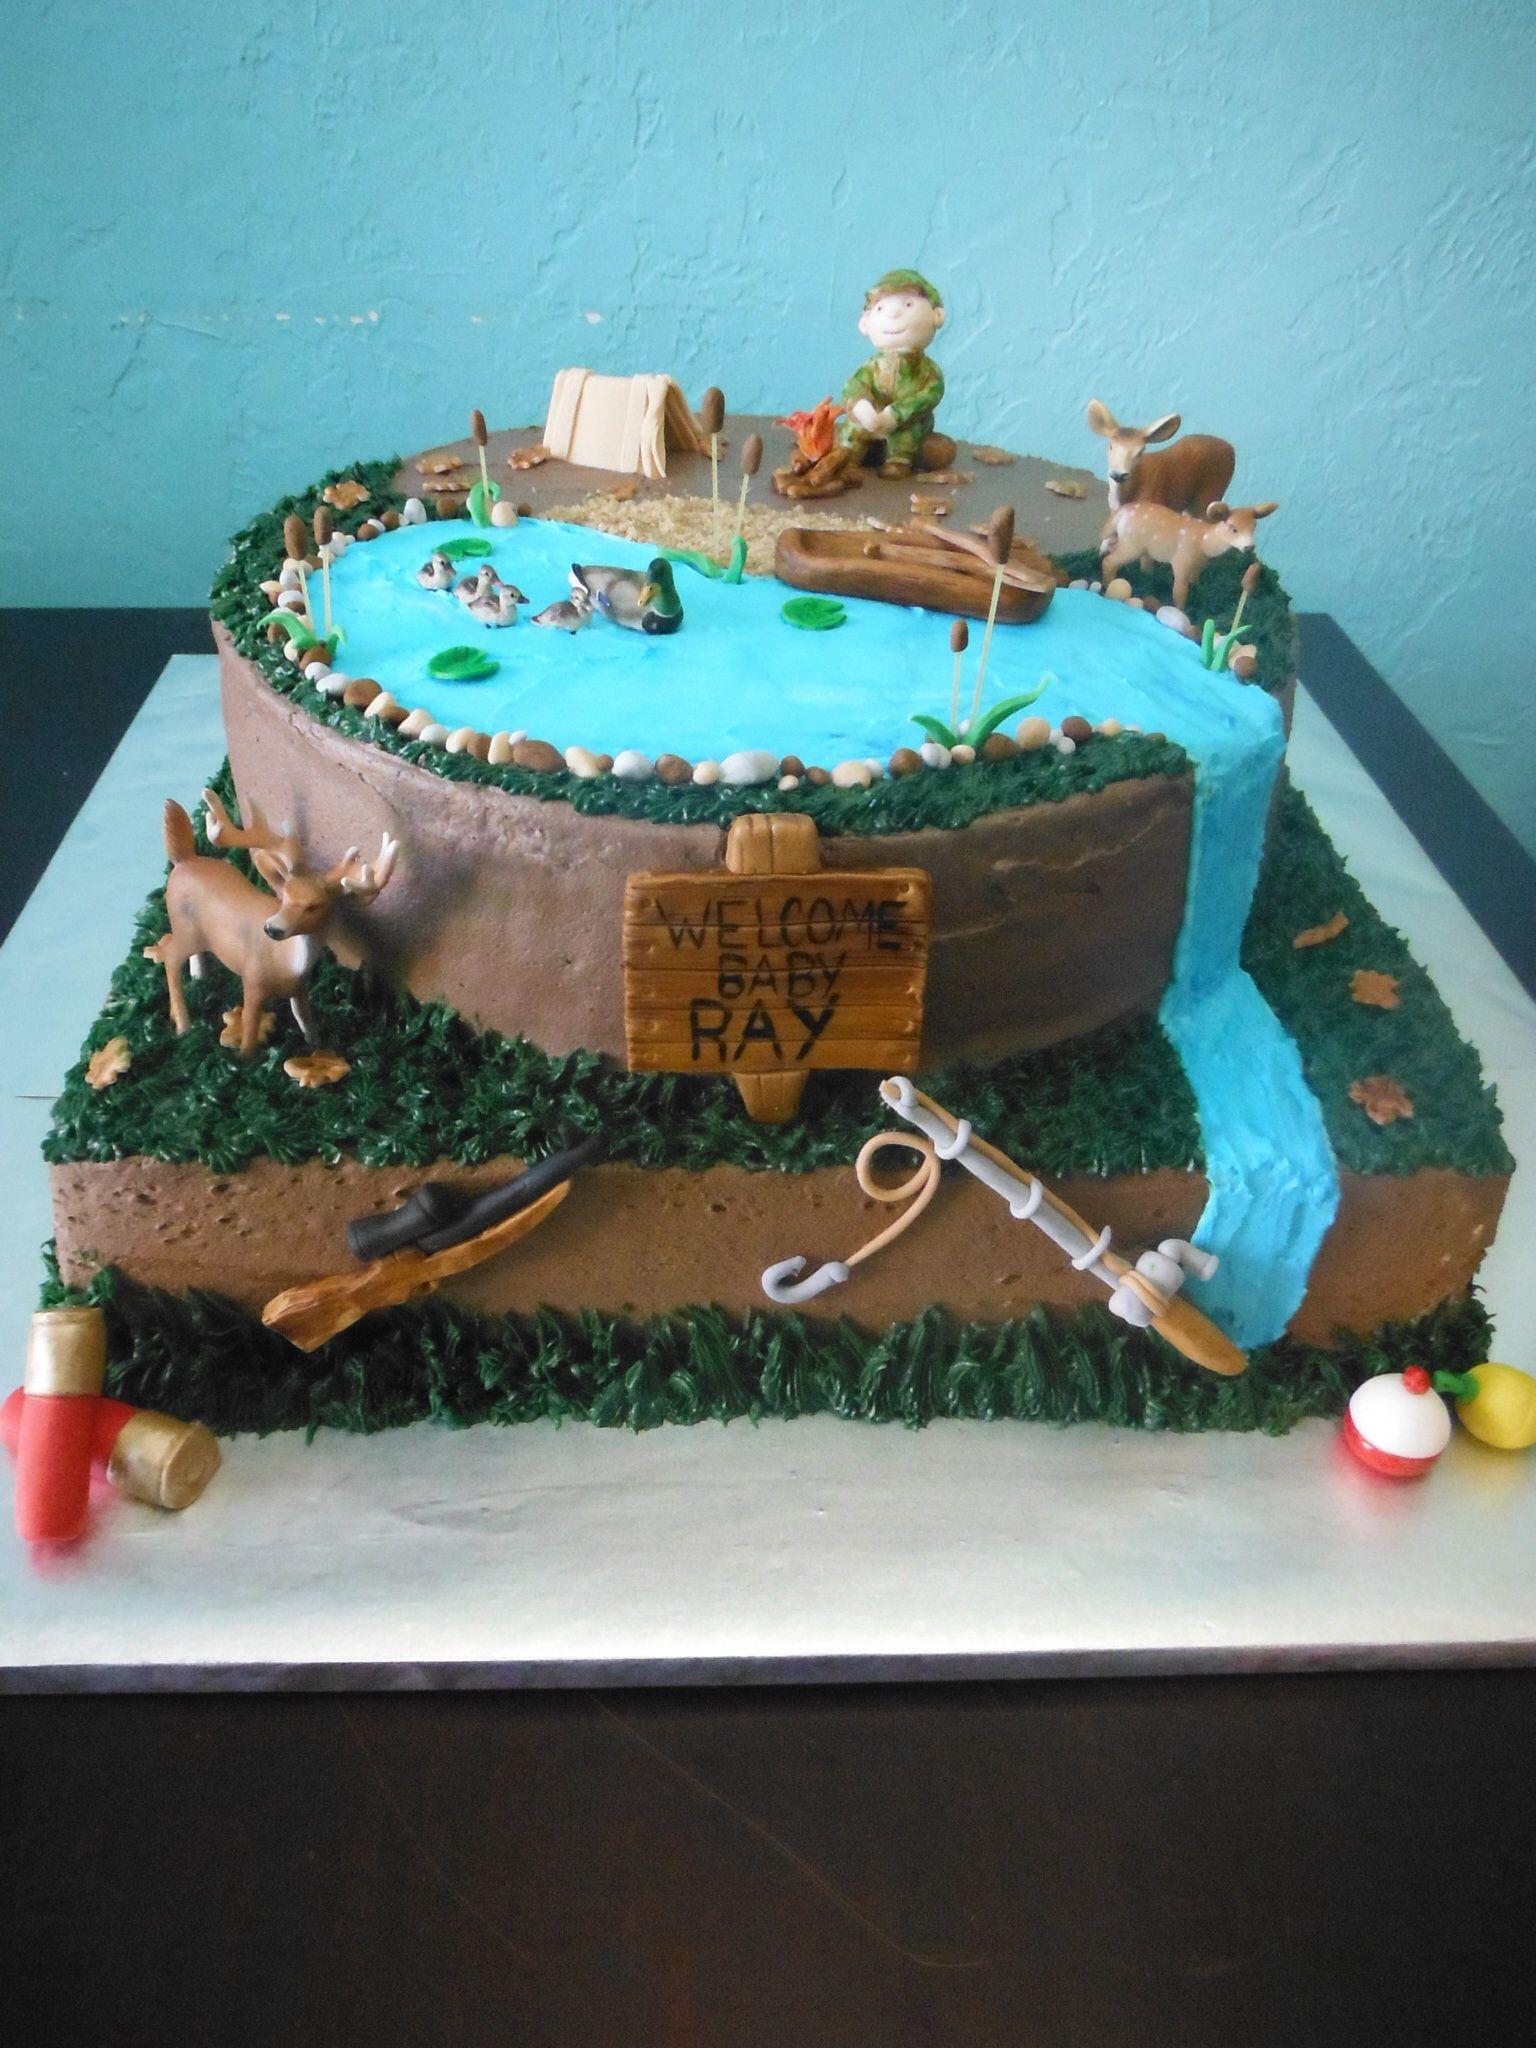 Huntingfishing cake My cakes Pinterest Fish Cake and Fishing